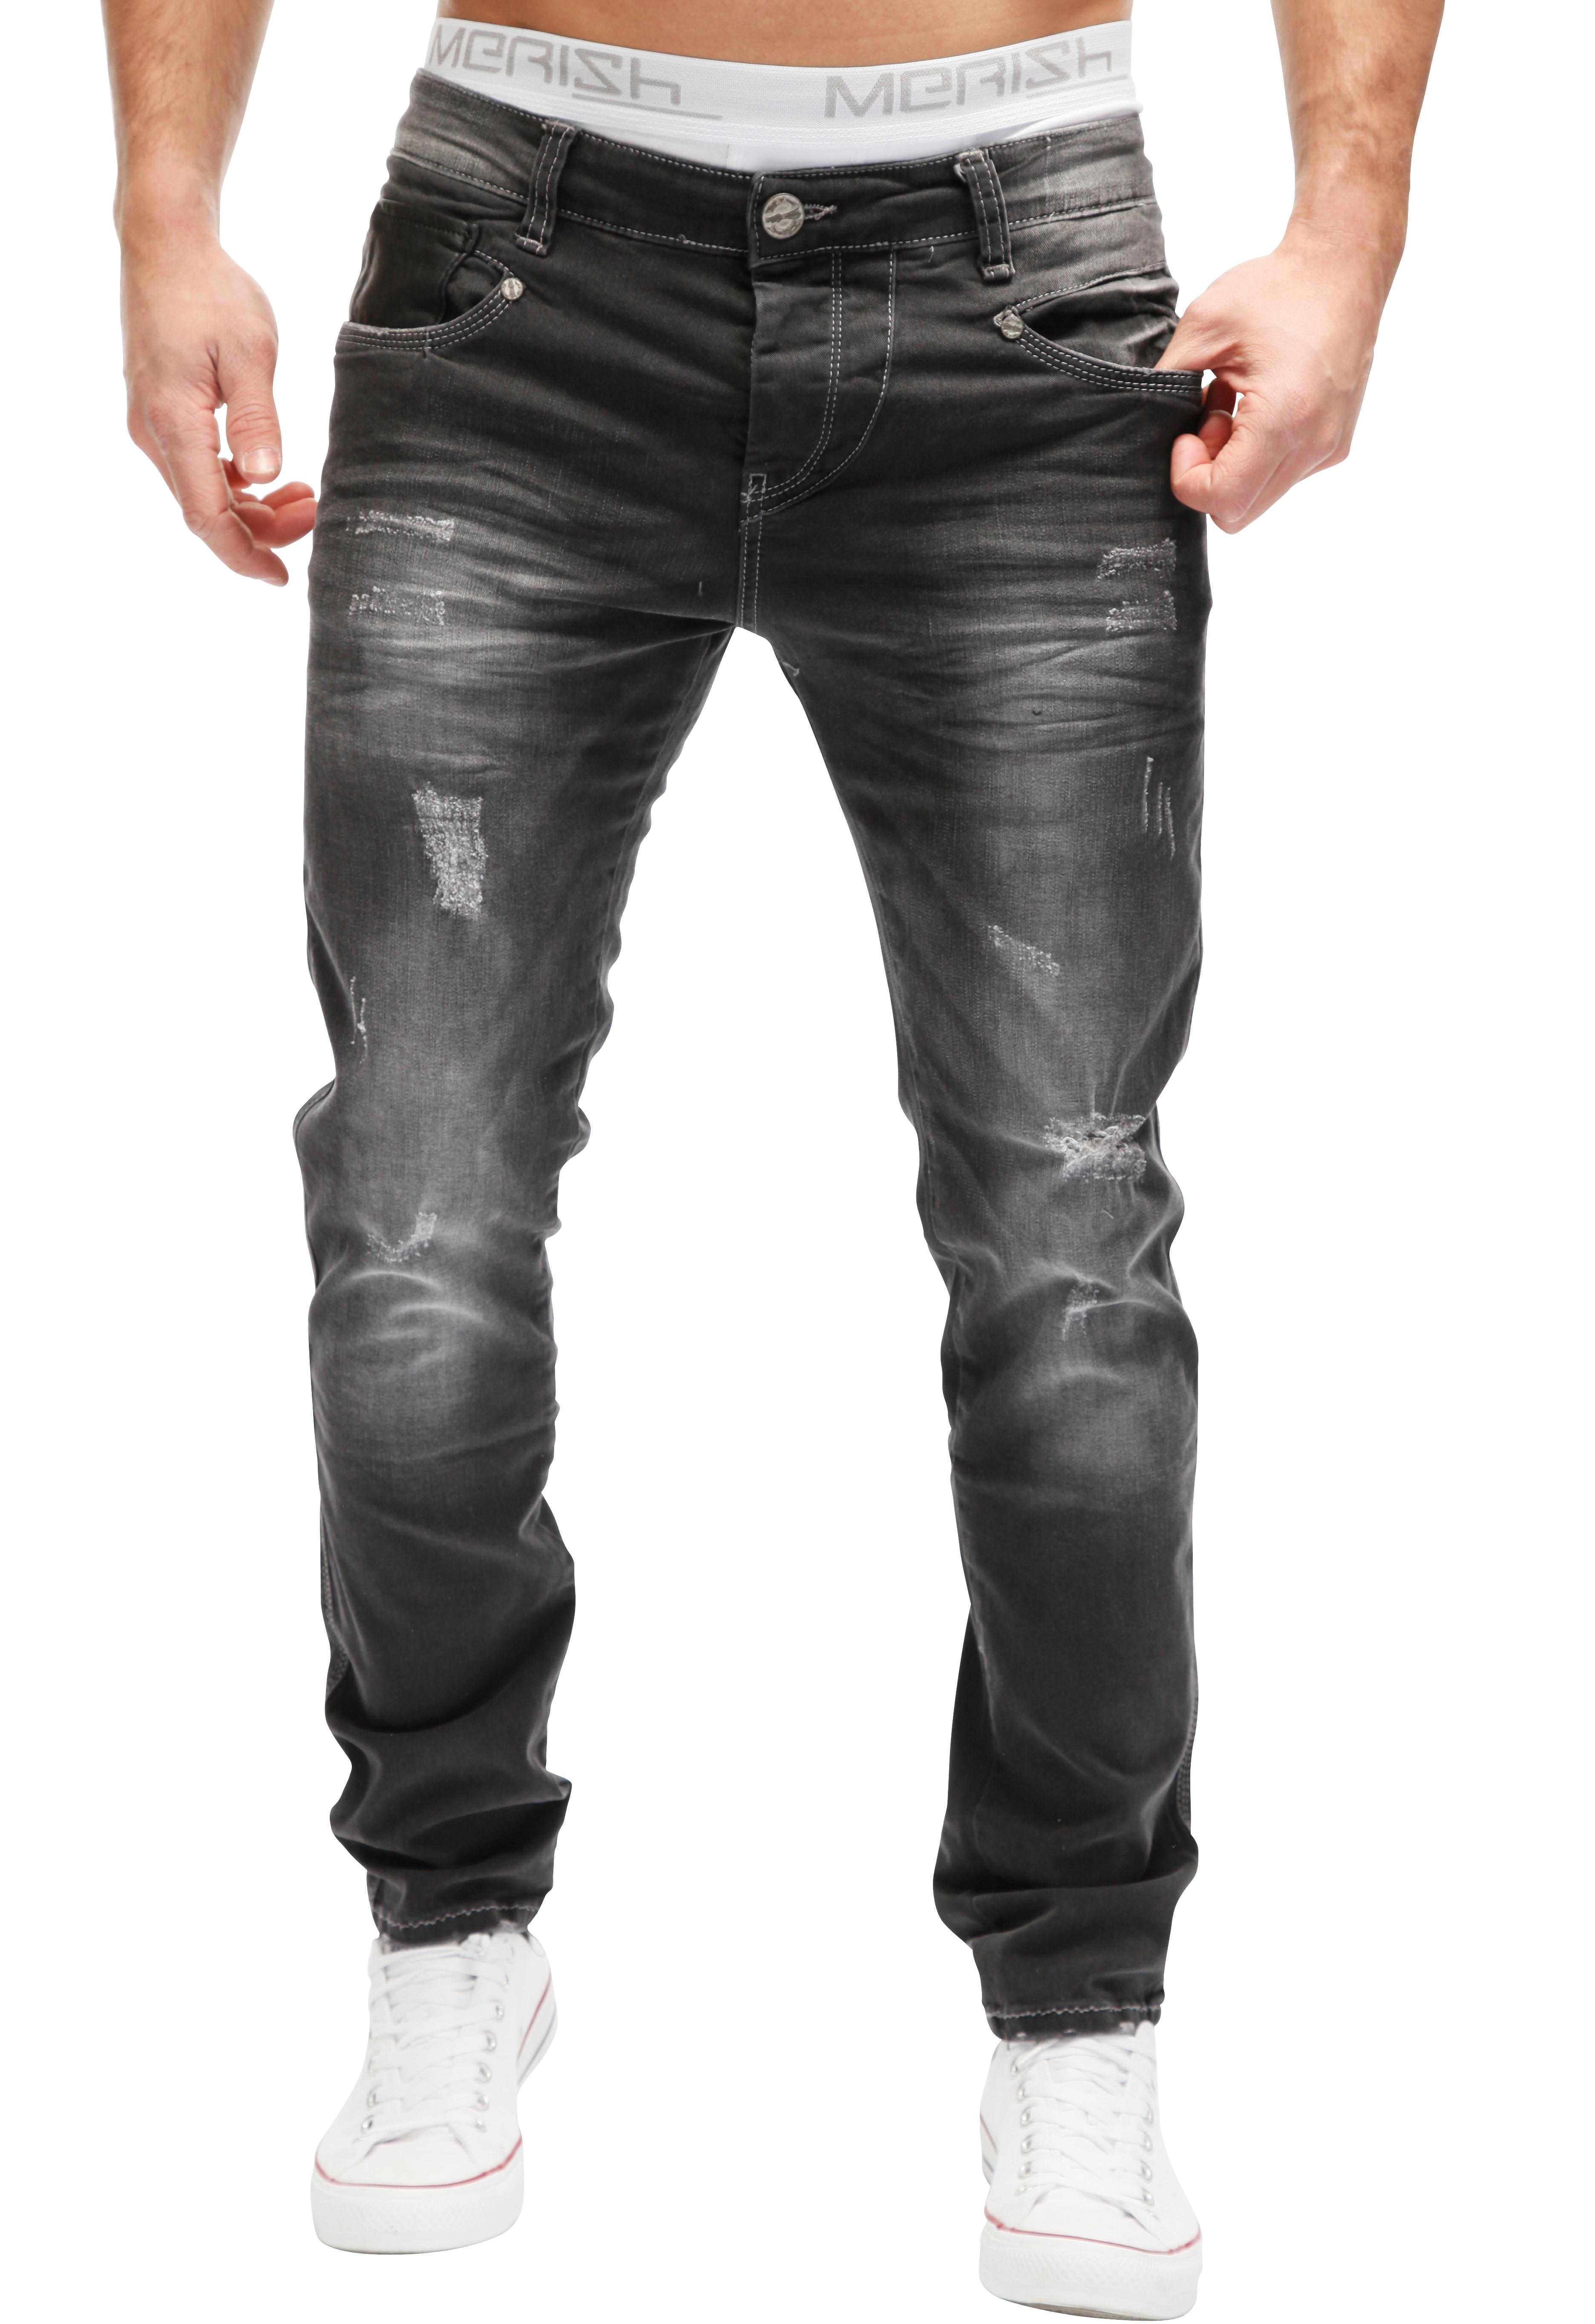 merish jeans herren jeanshose biker look zipper chino blau. Black Bedroom Furniture Sets. Home Design Ideas